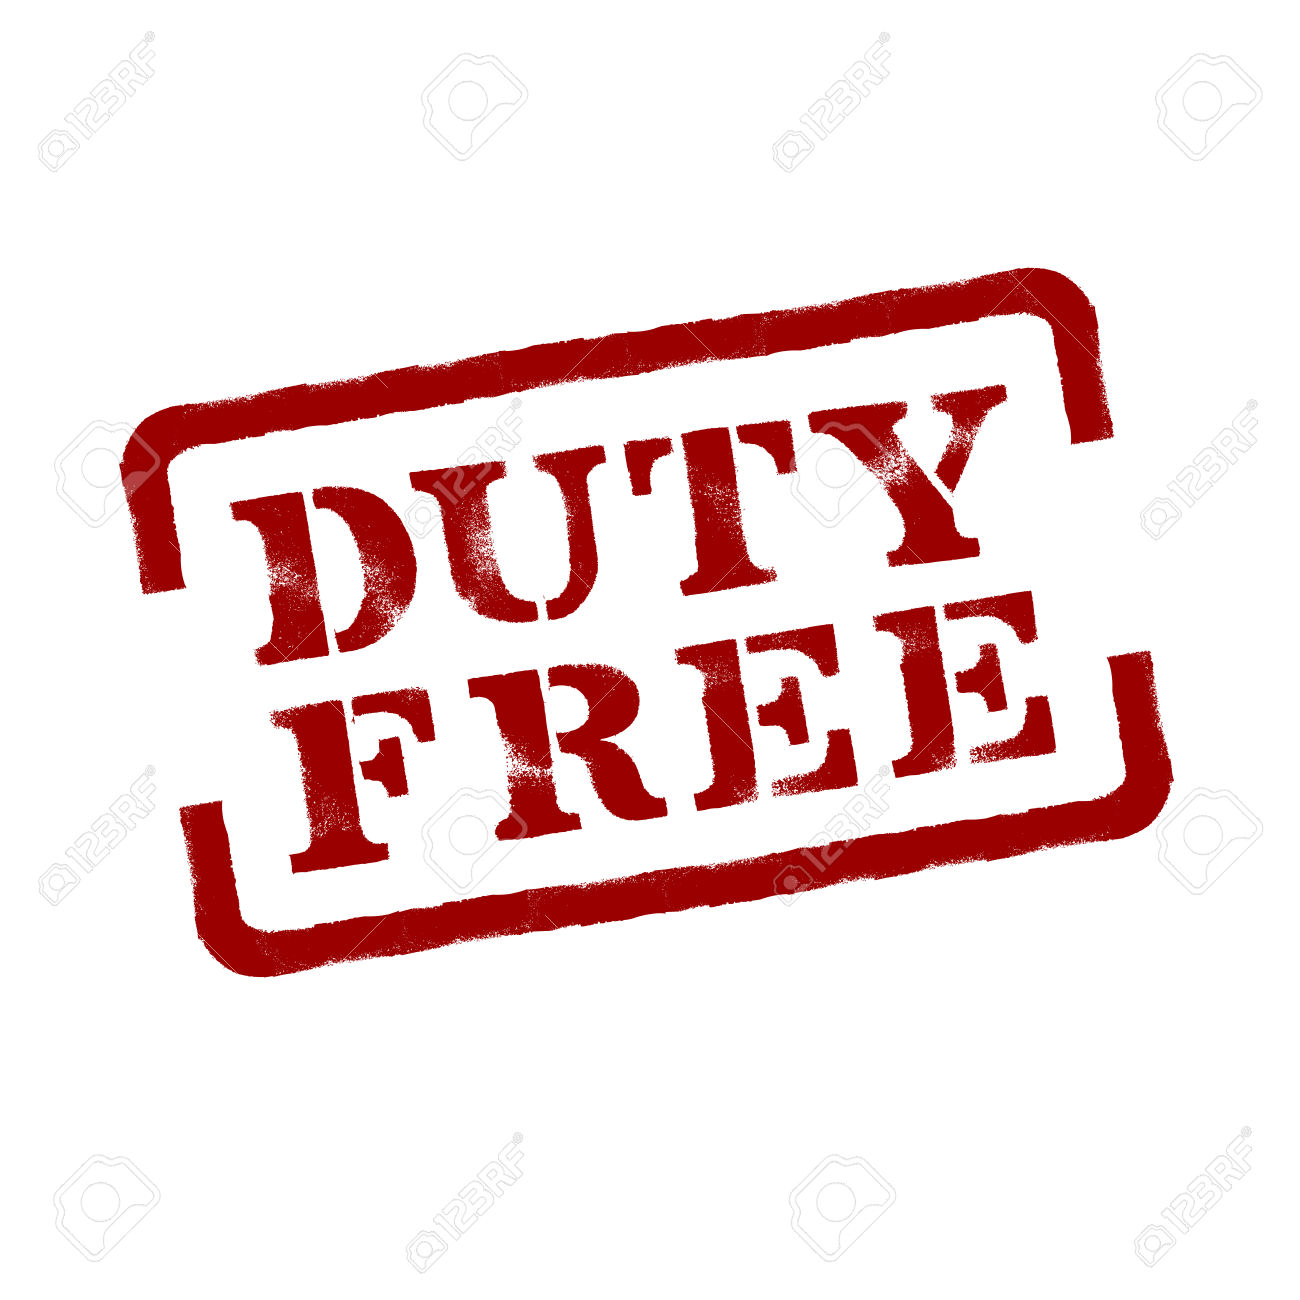 Duty free clipart.